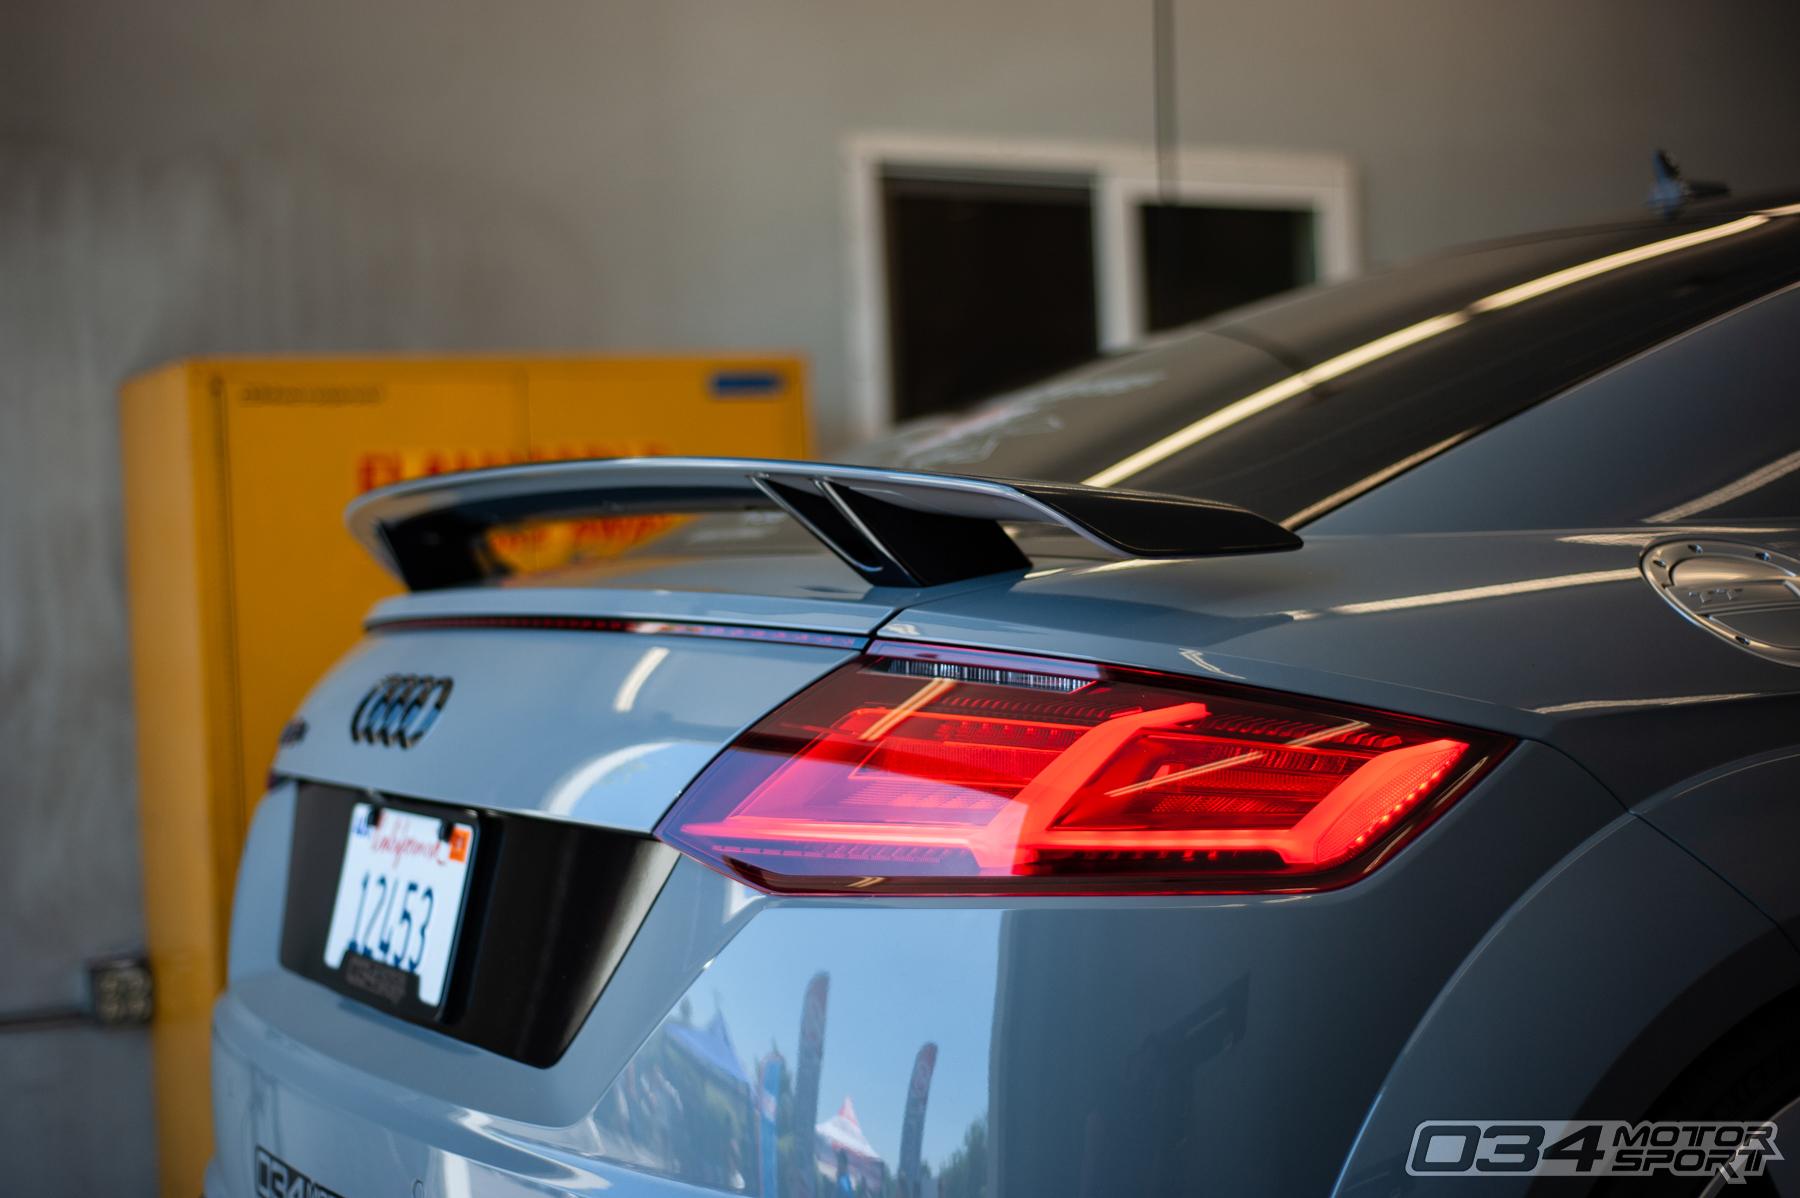 Stage 1 MkIII Audi TTRS Dyno Pull